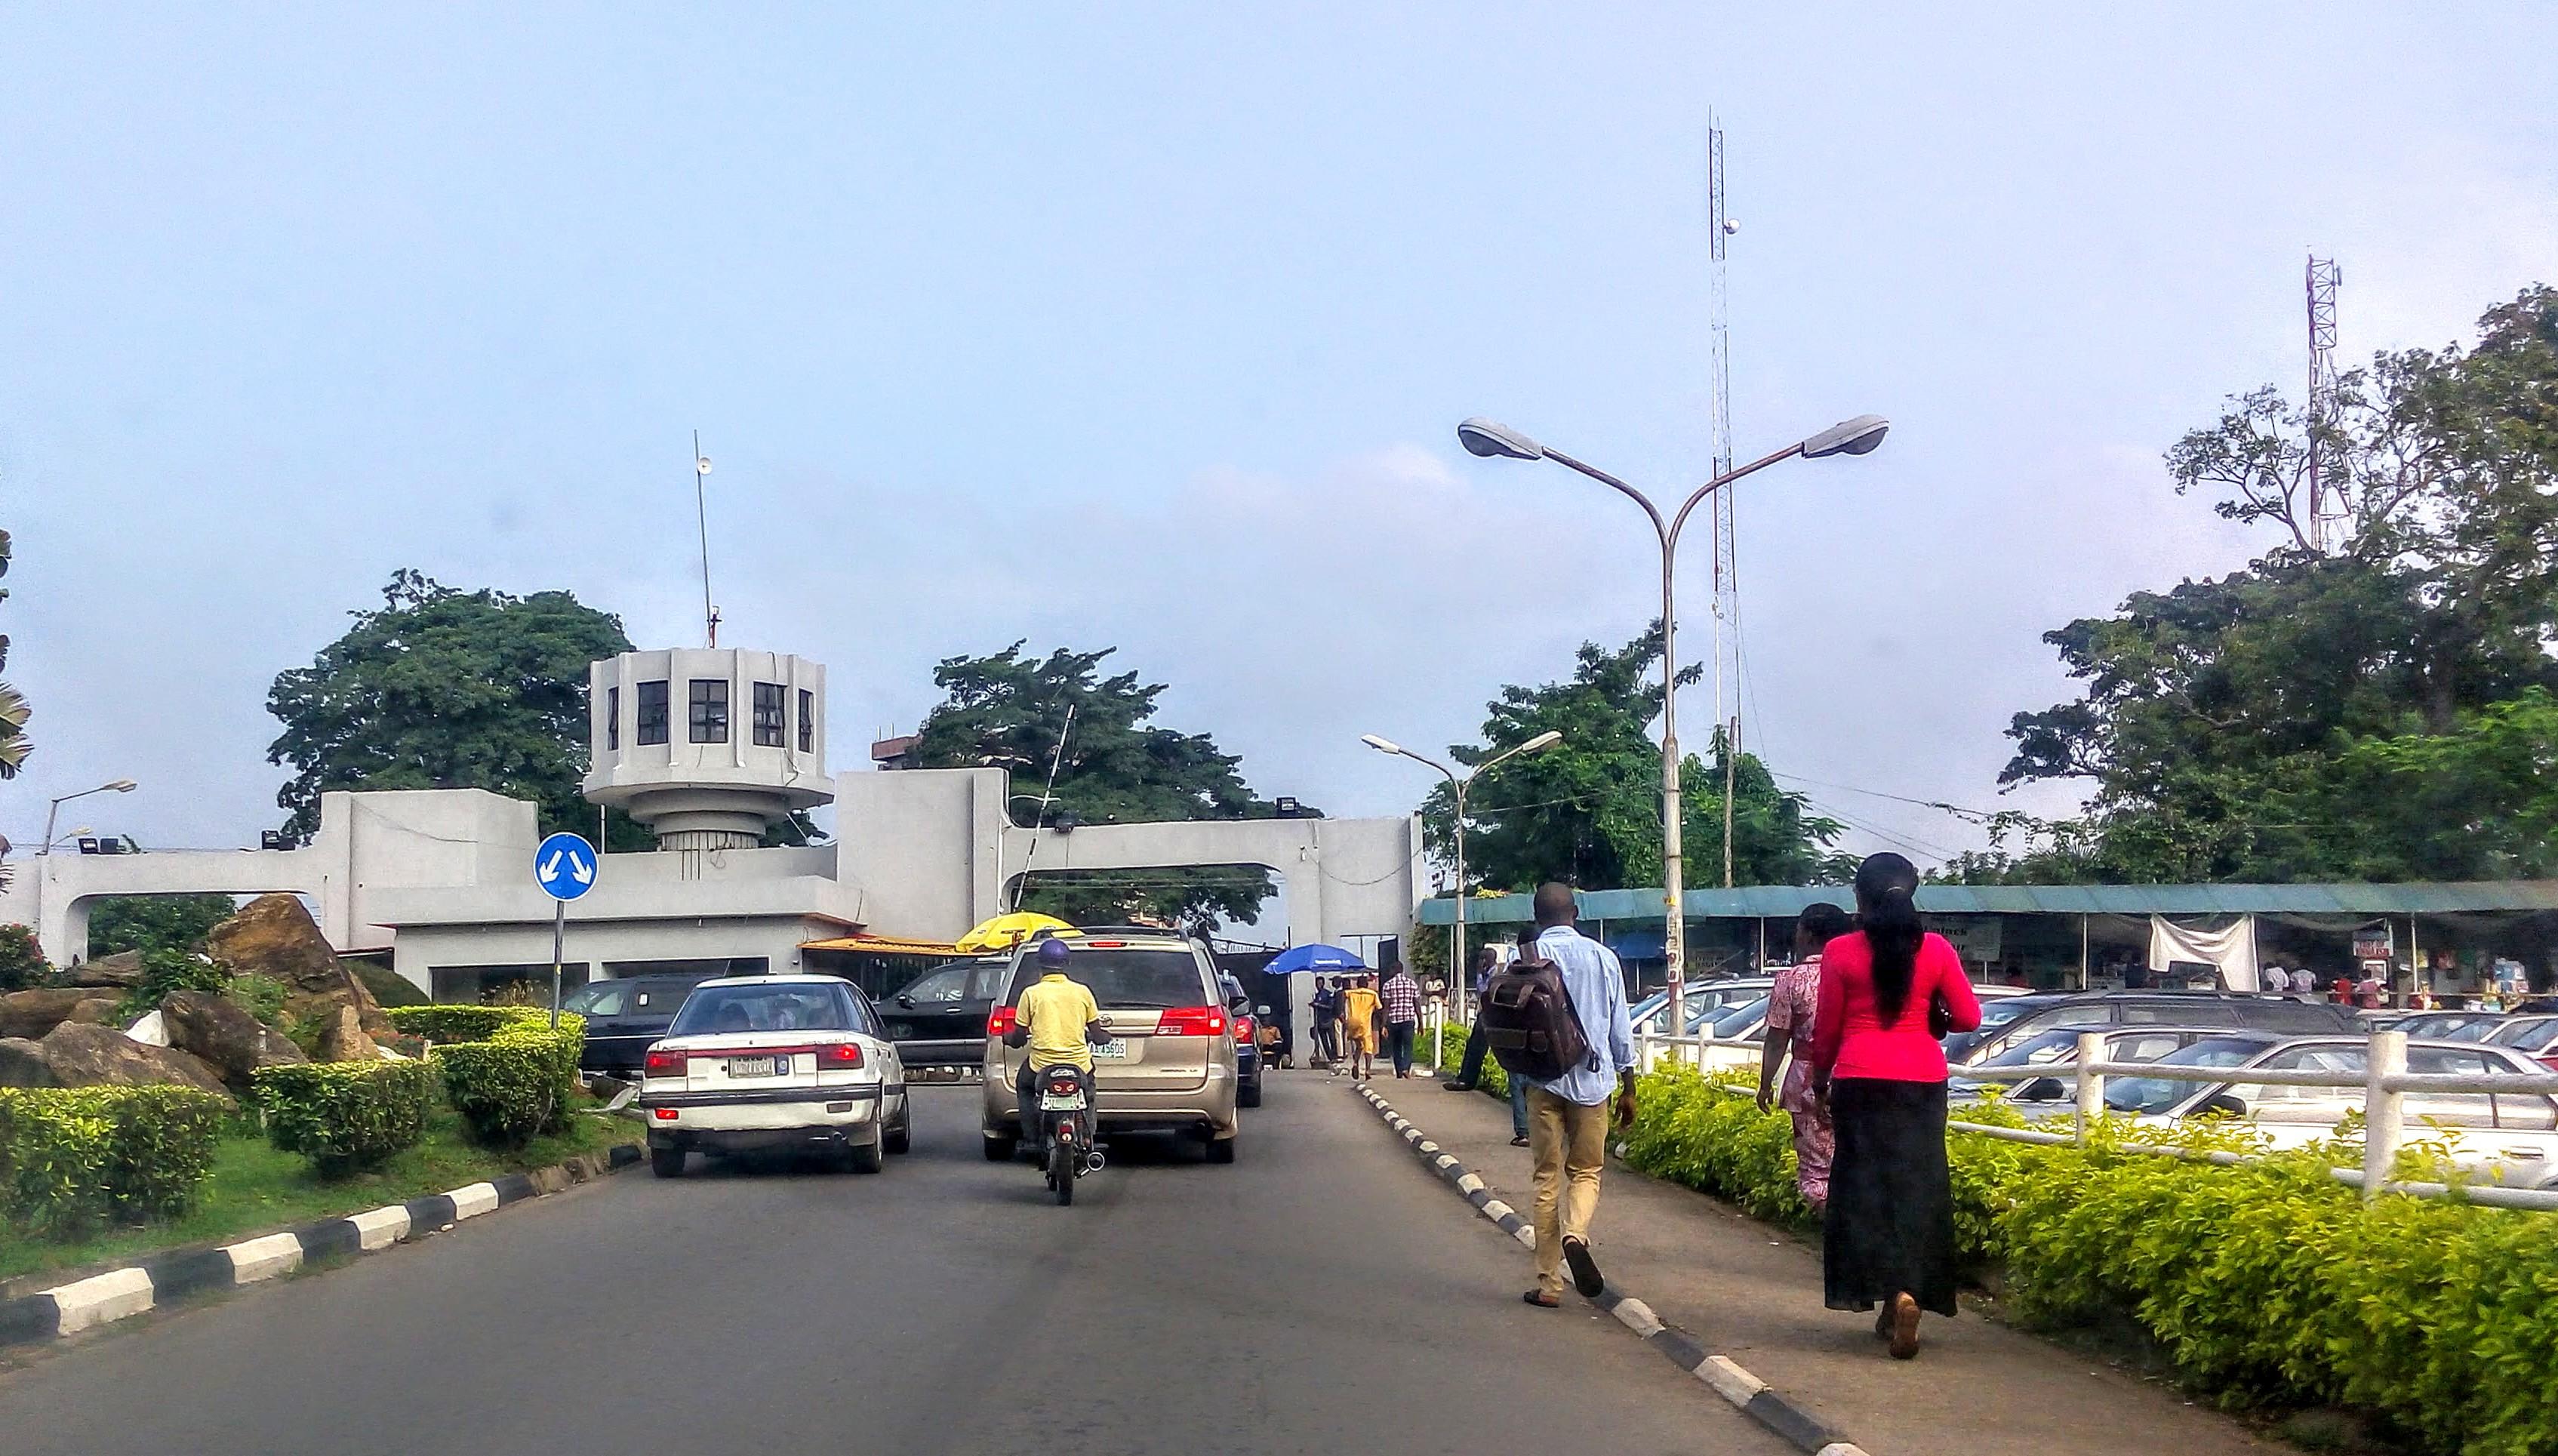 University of Ibadan - Wikipedia